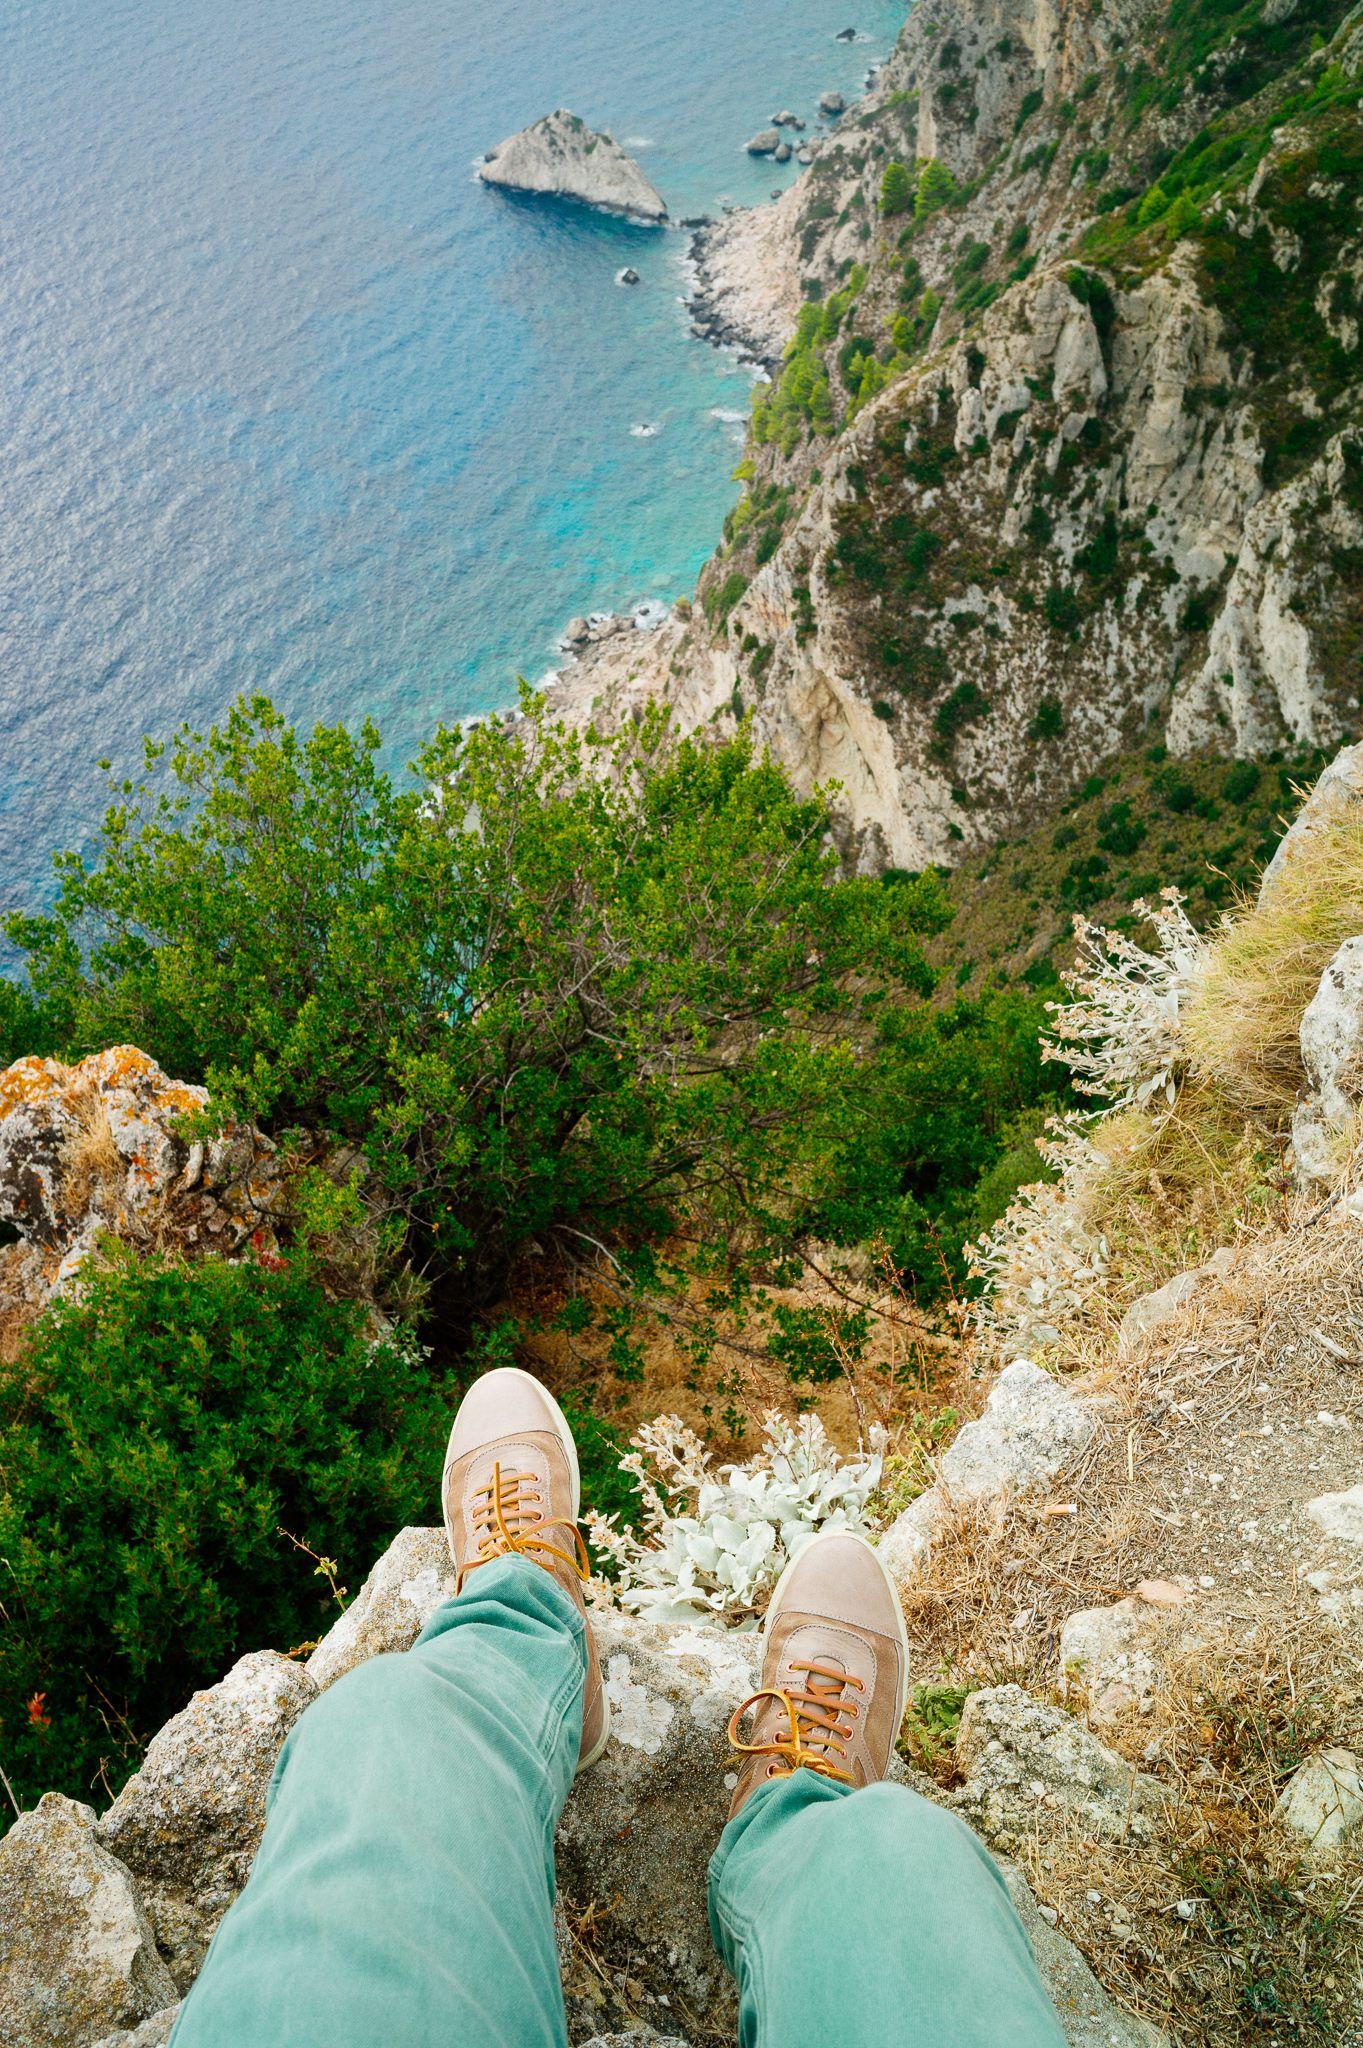 greece_corfu_28mm_elmarit_asph_on_edge_cliff